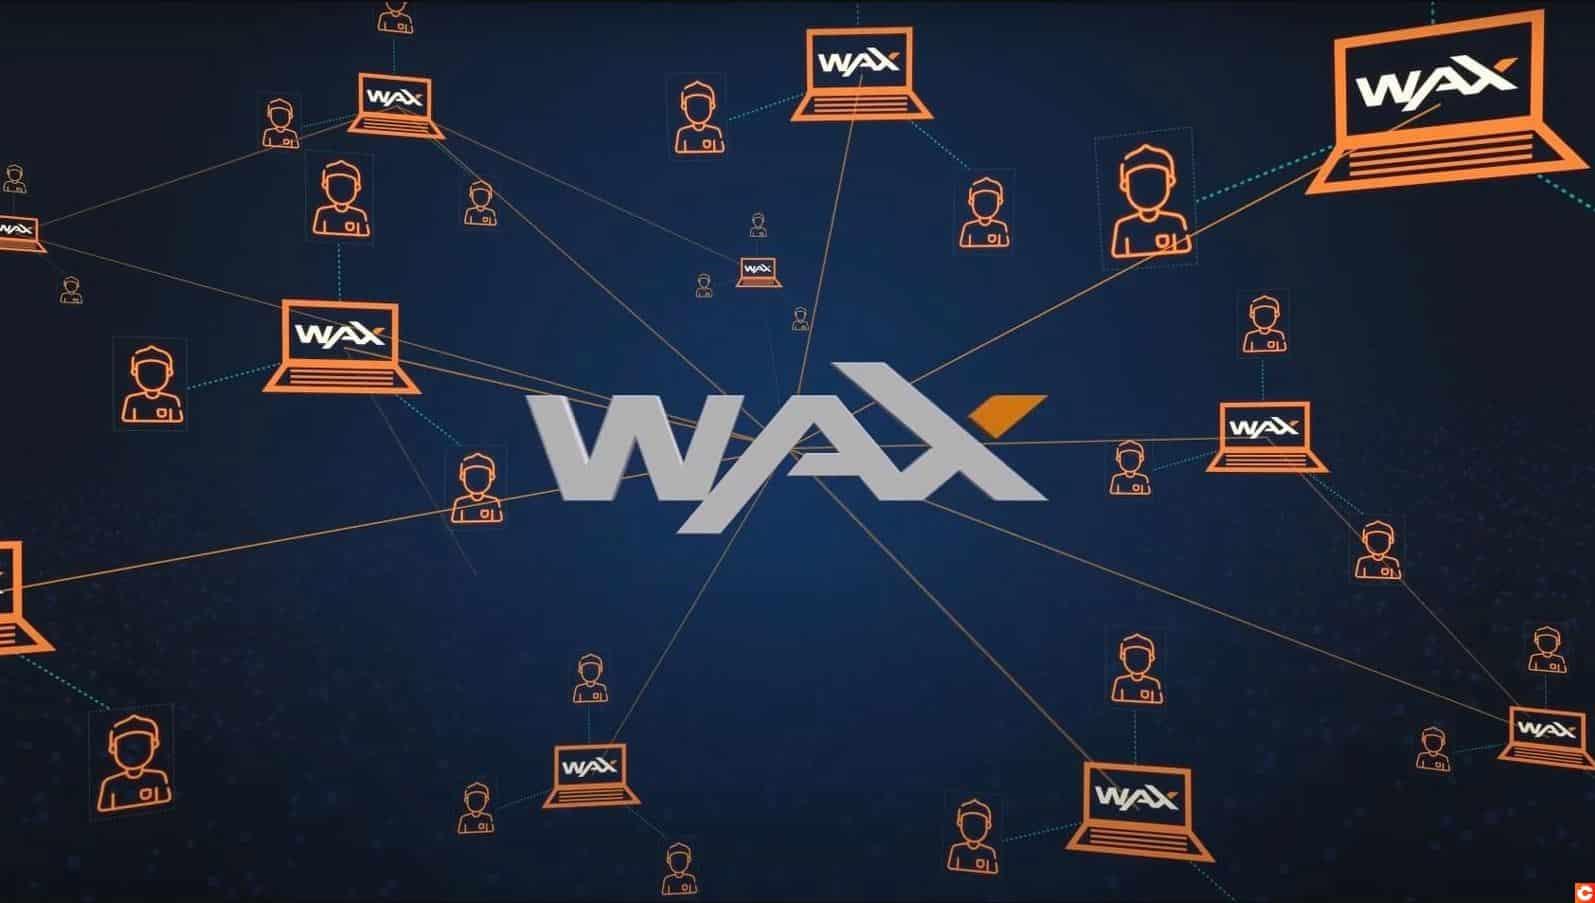 WAX blockchain